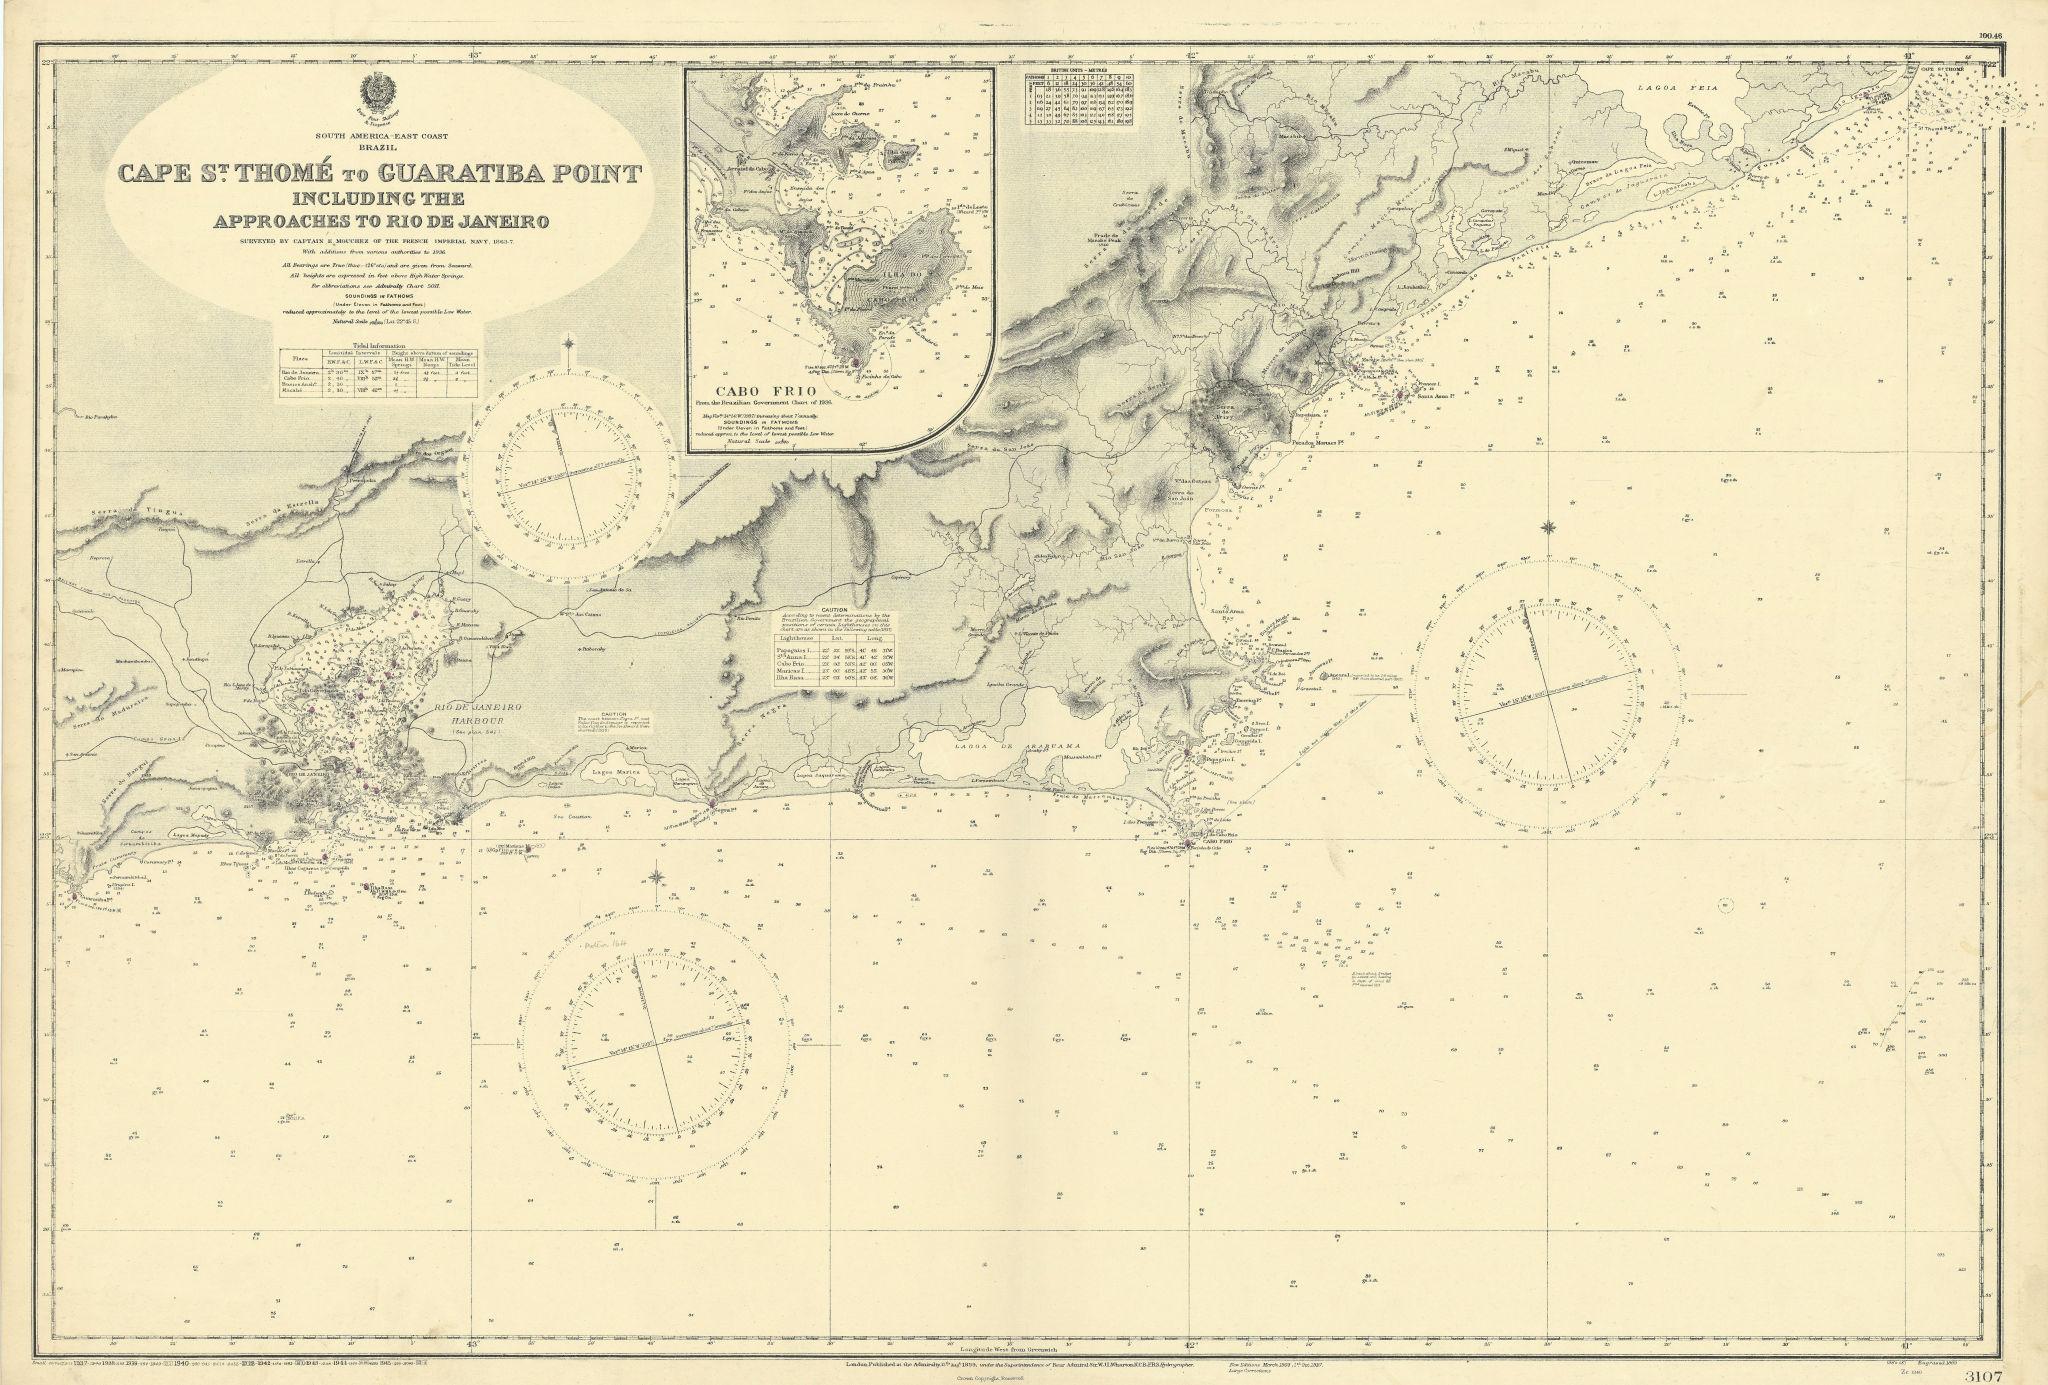 Rio de Janeiro coast & approaches. Brazil. ADMIRALTY sea chart 1899 (1945) map